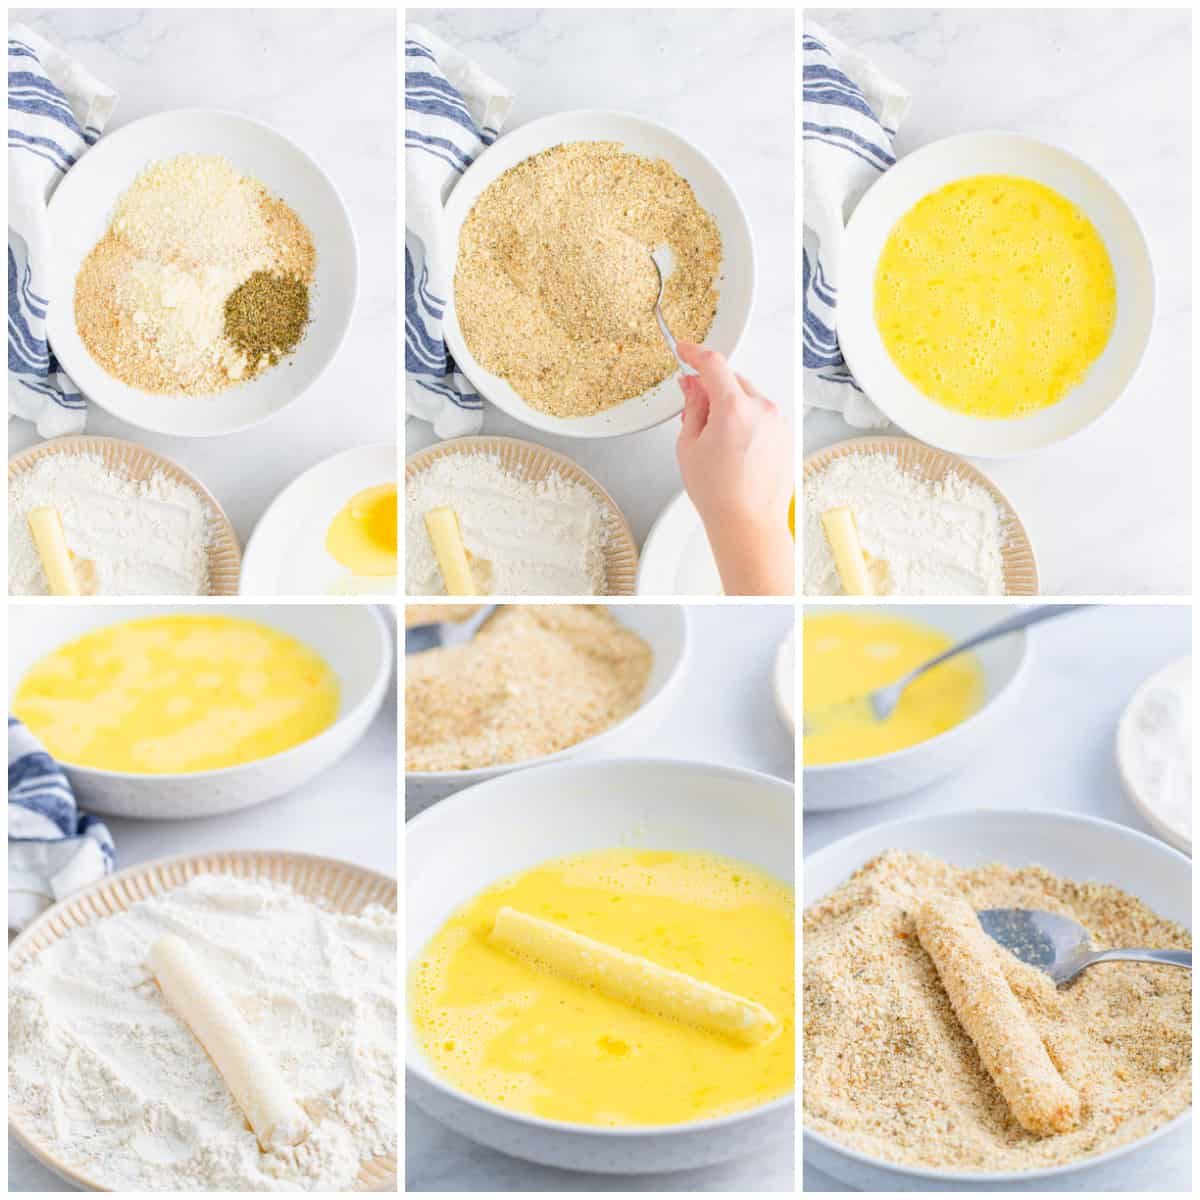 Step by step photos on how to make Mozzarella sticks